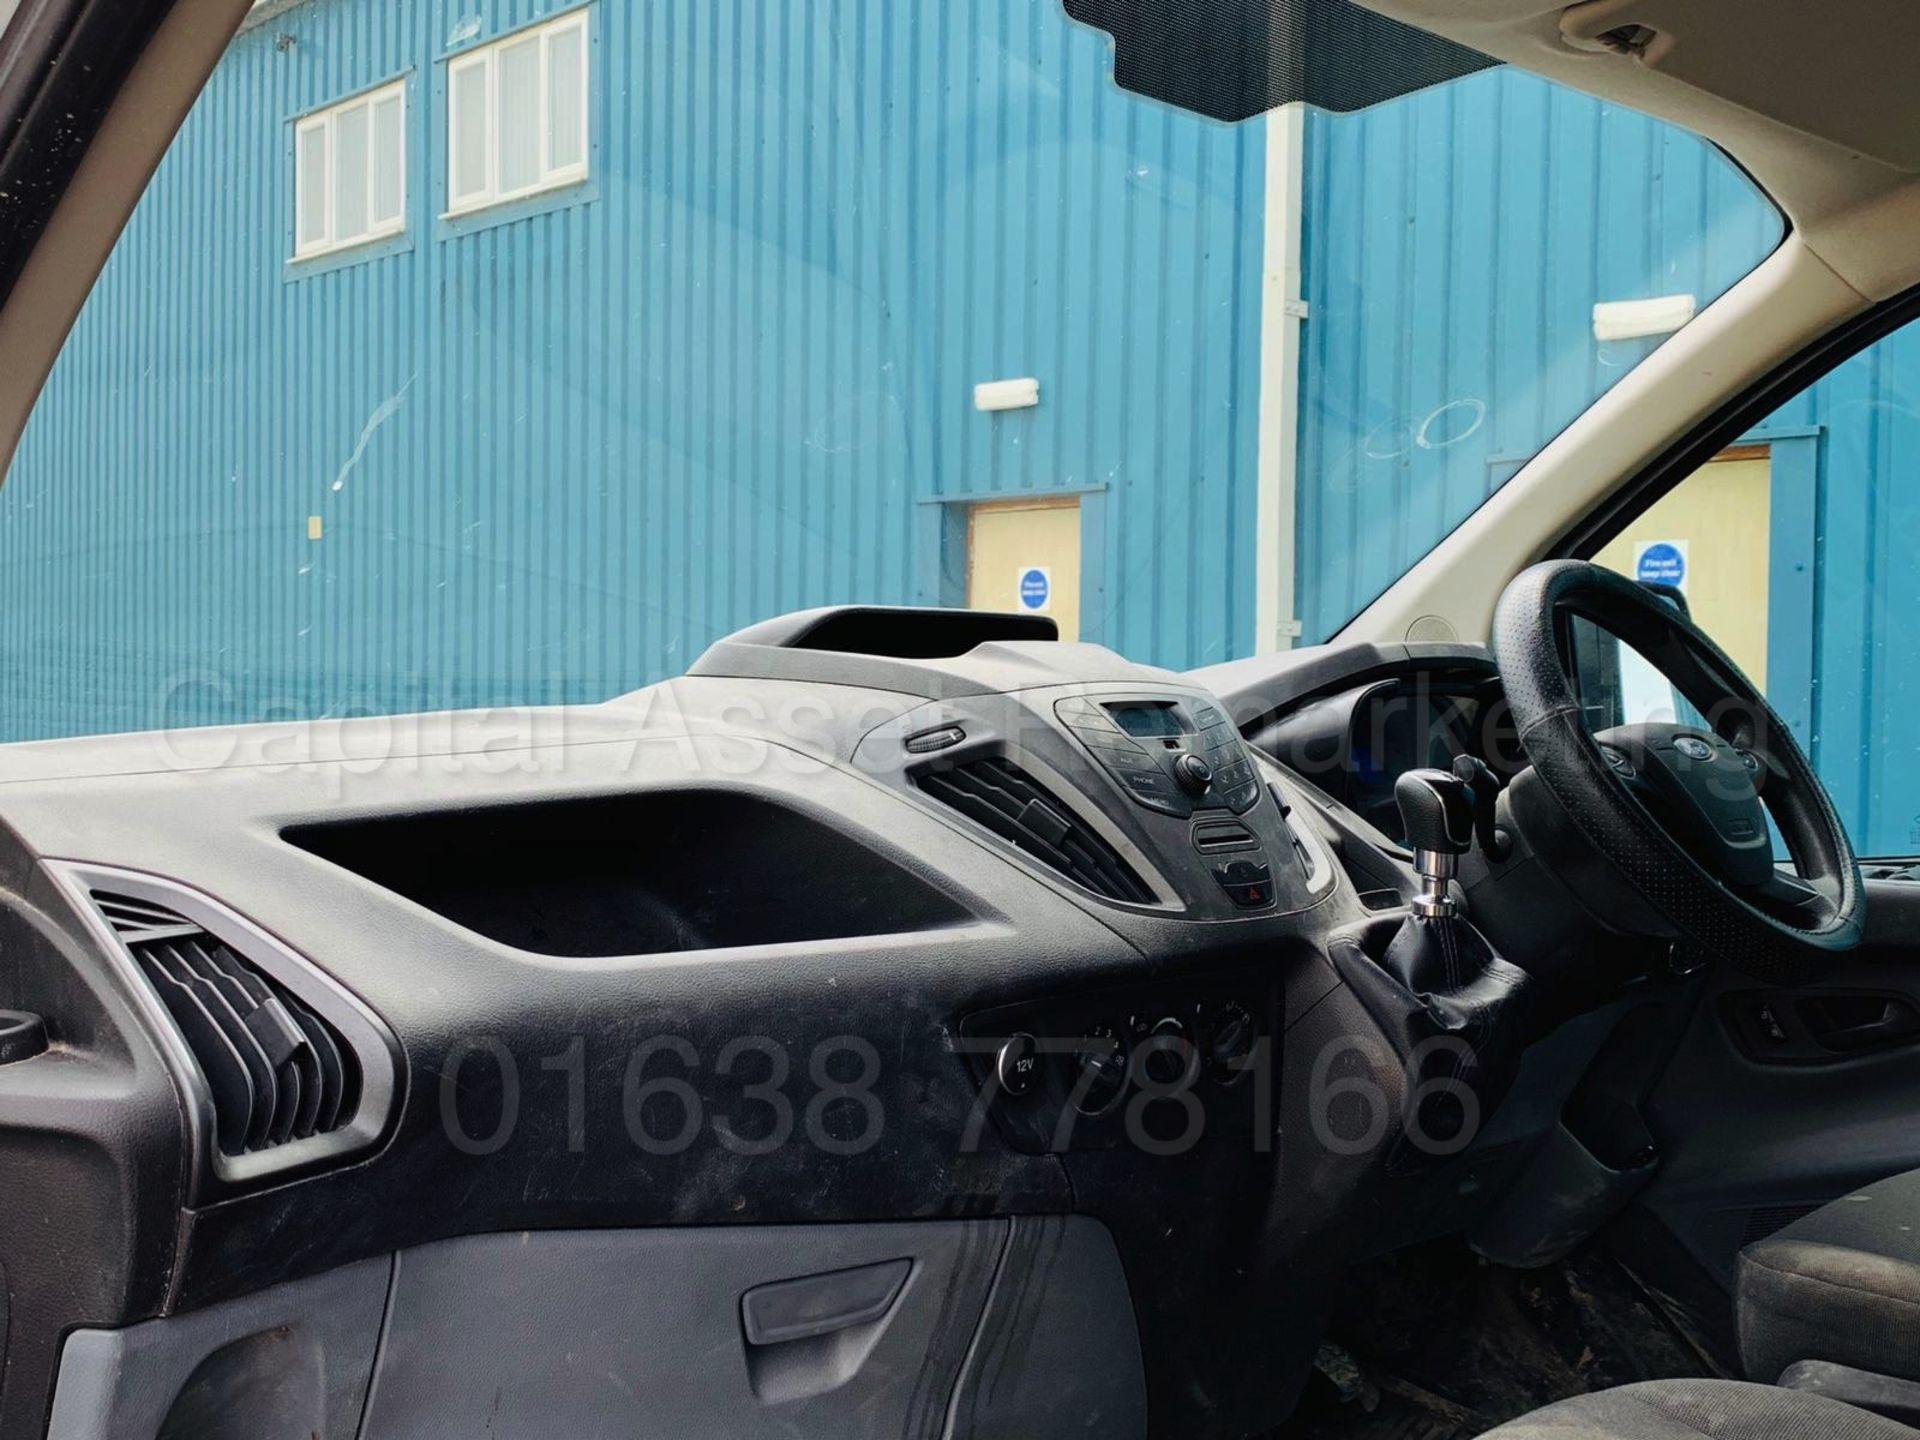 Lot 15 - FORD TRANSIT CUSTOM 290 ECO-TECH *LCV - SWB PANEL VAN* (2015) '2.2 TDCI - 6 SPEED'